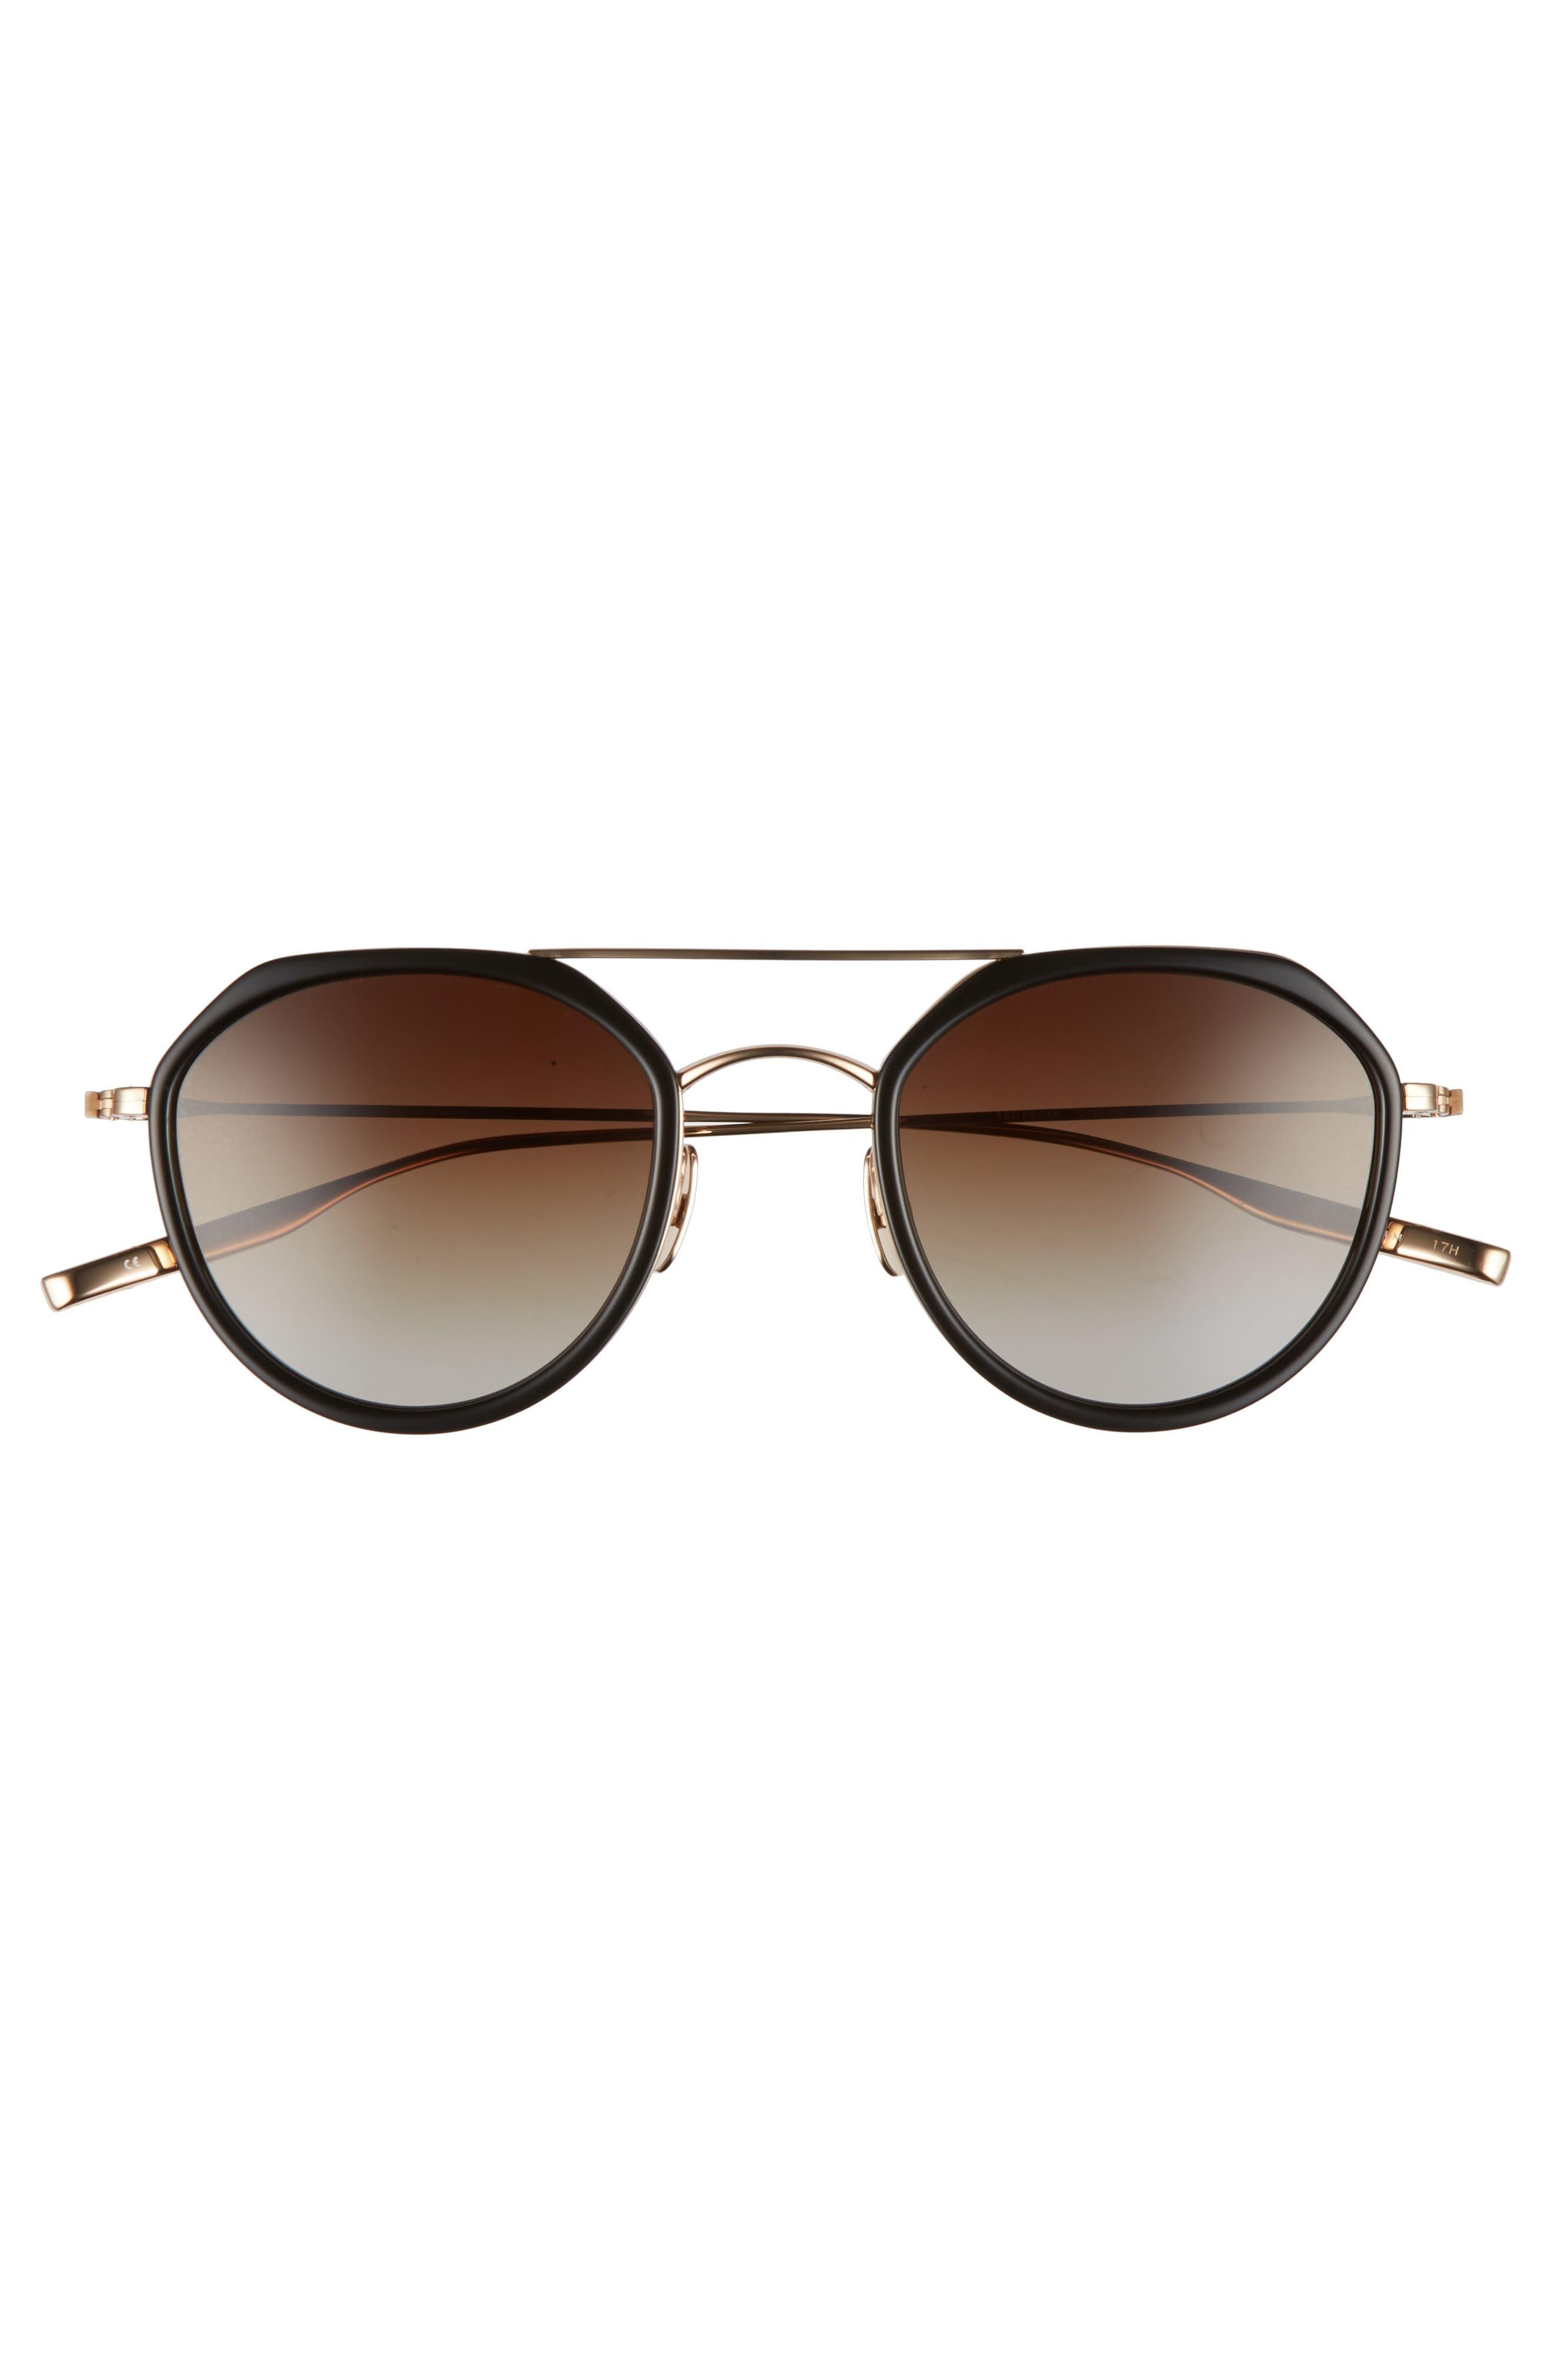 Dibergi Resin 50mm Polarized Round Sunglasses,                             Alternate thumbnail 3, color,                             BLACK/ HONEY GOLD